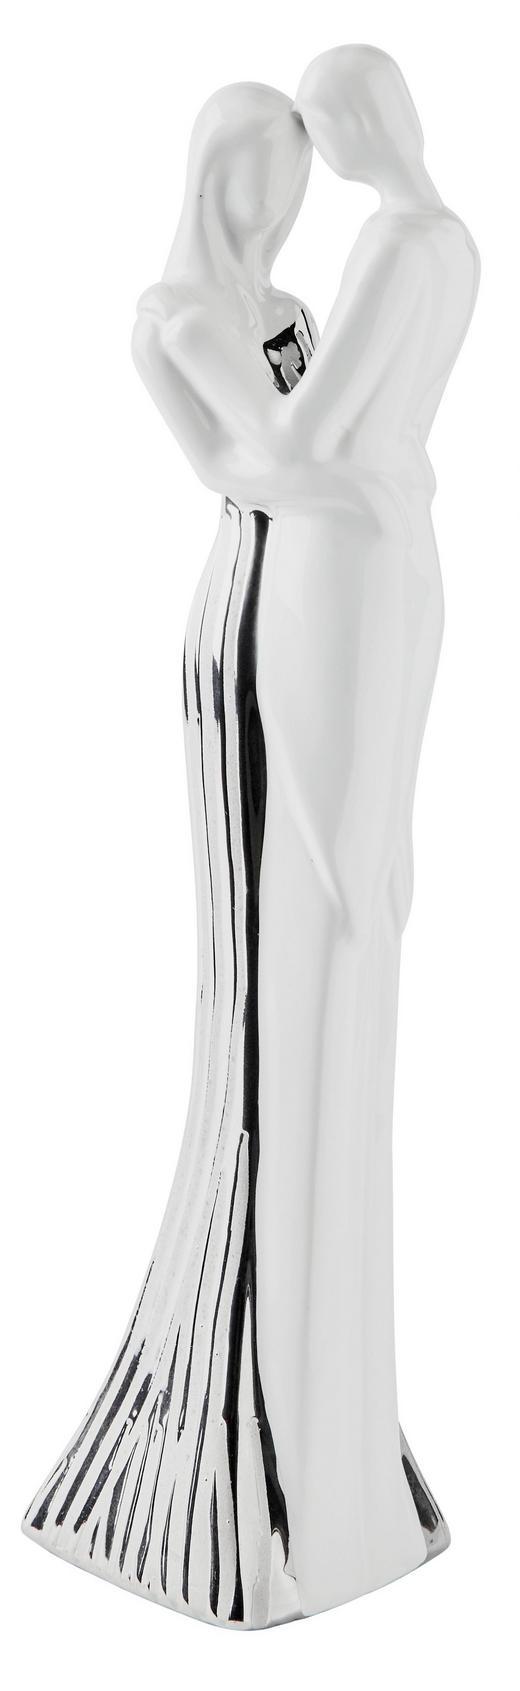 DEKODAME - Silberfarben/Weiß, Basics, Keramik (10/36,5/7,8cm) - Ambia Home